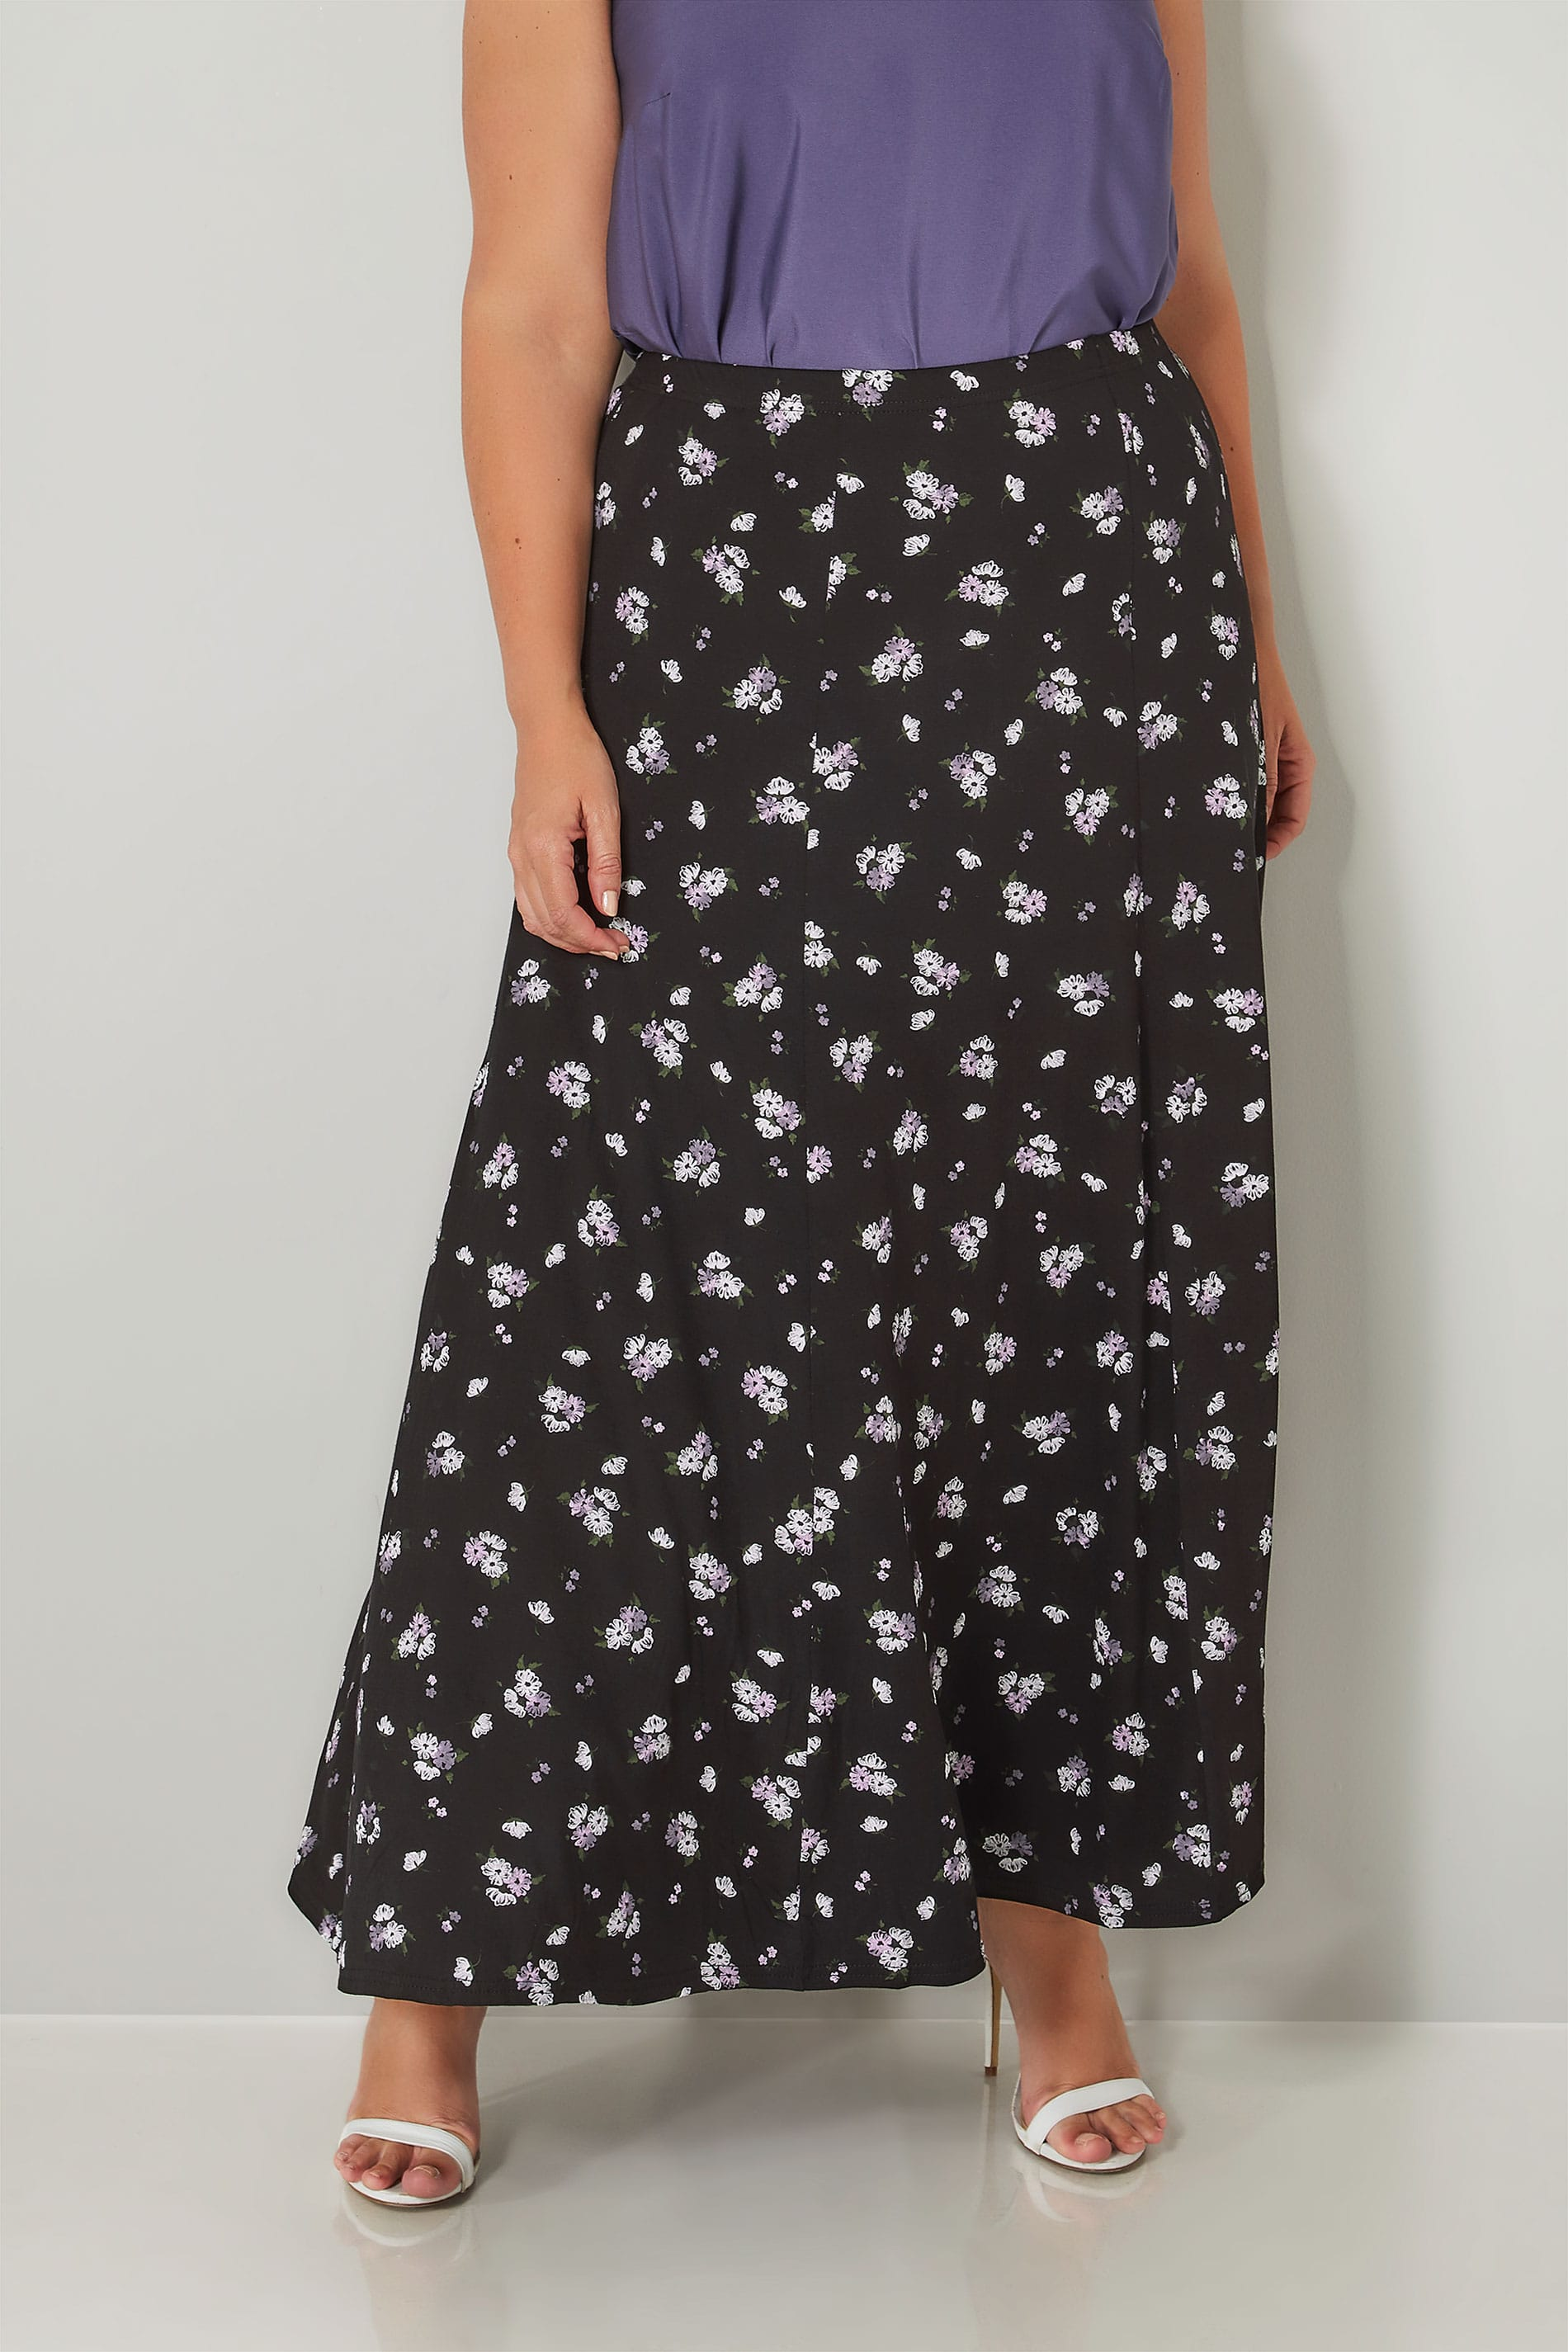 Black & Purple Floral Print Maxi Skirt